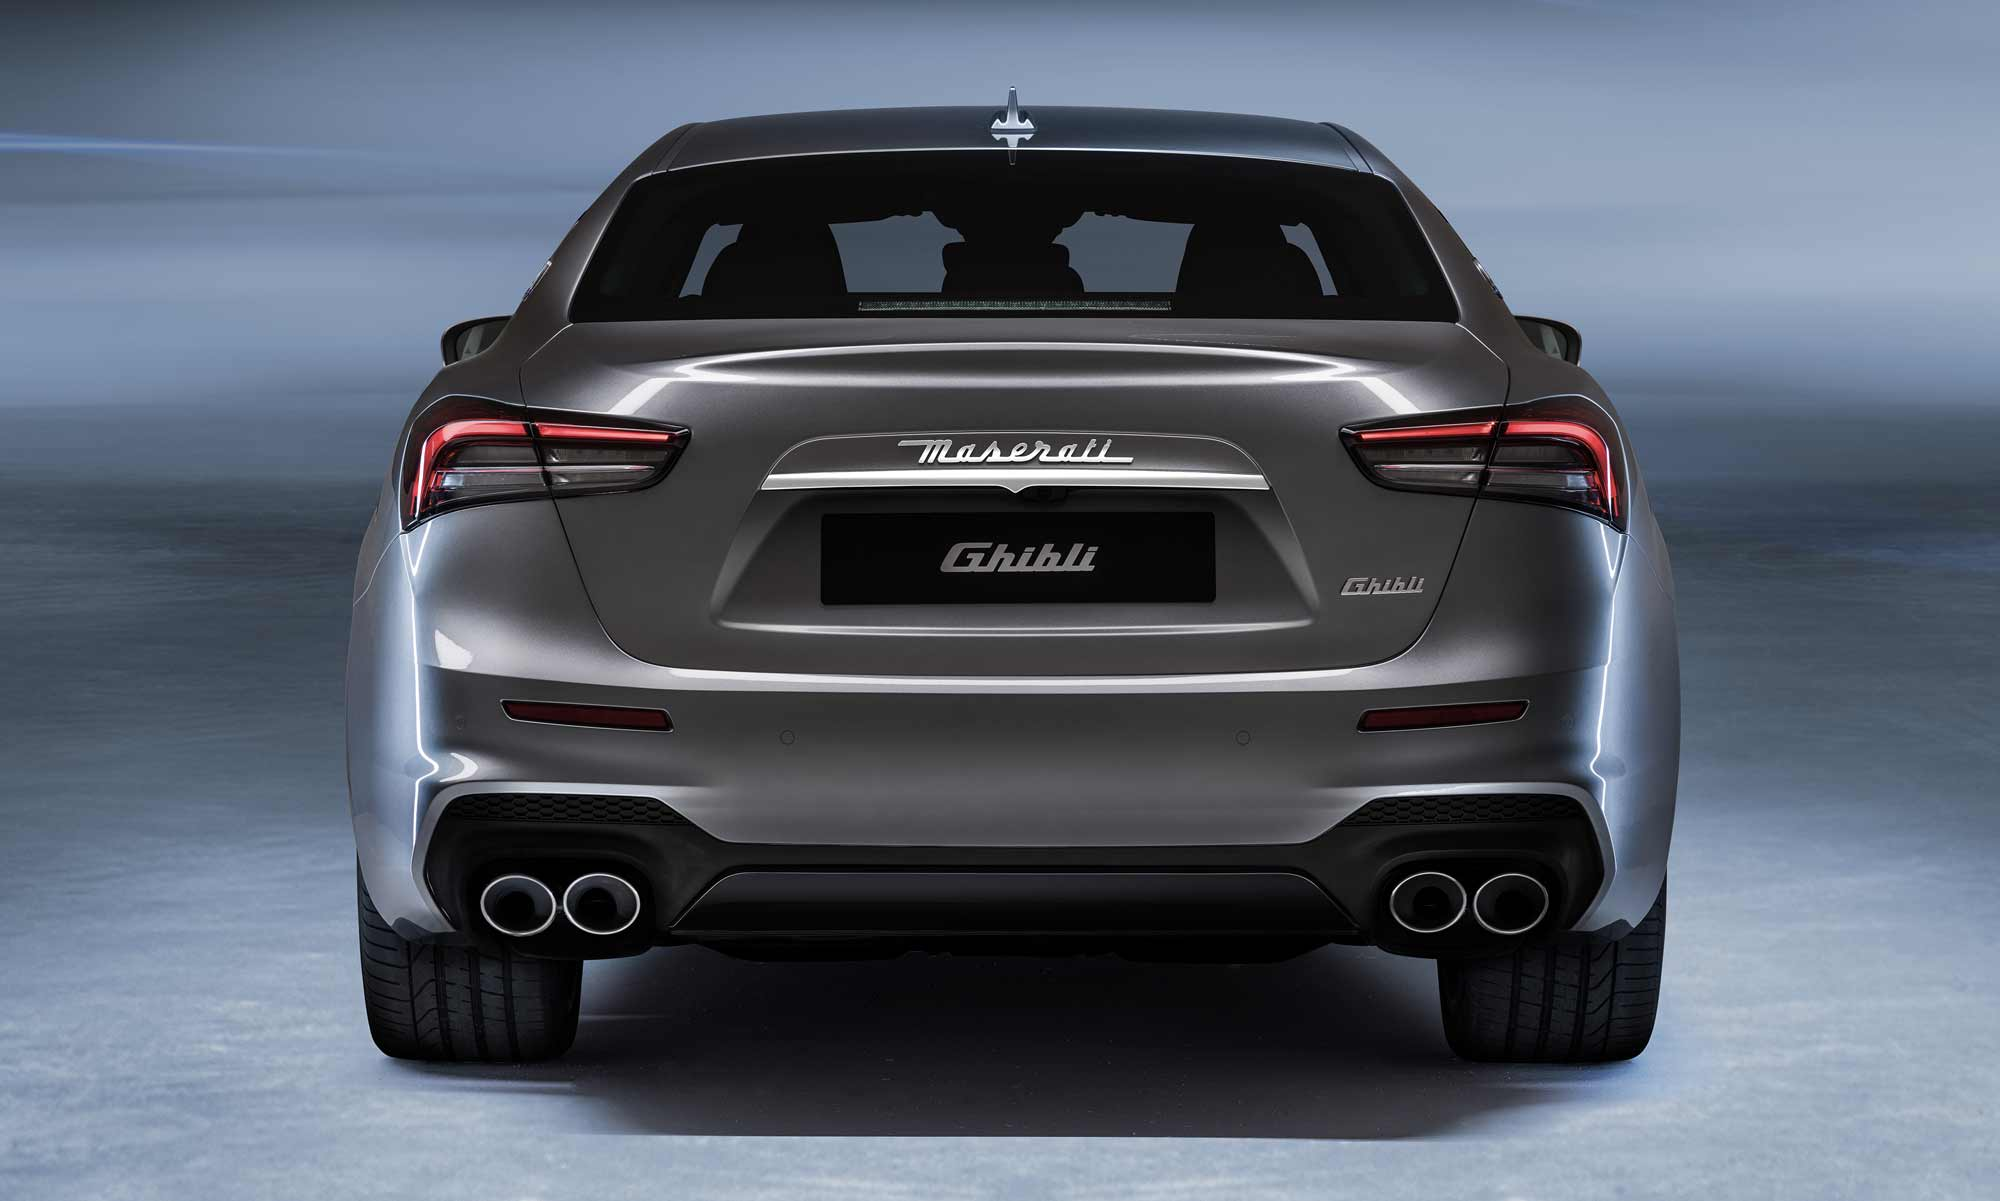 Retro Maserati Ghibli Hybrid